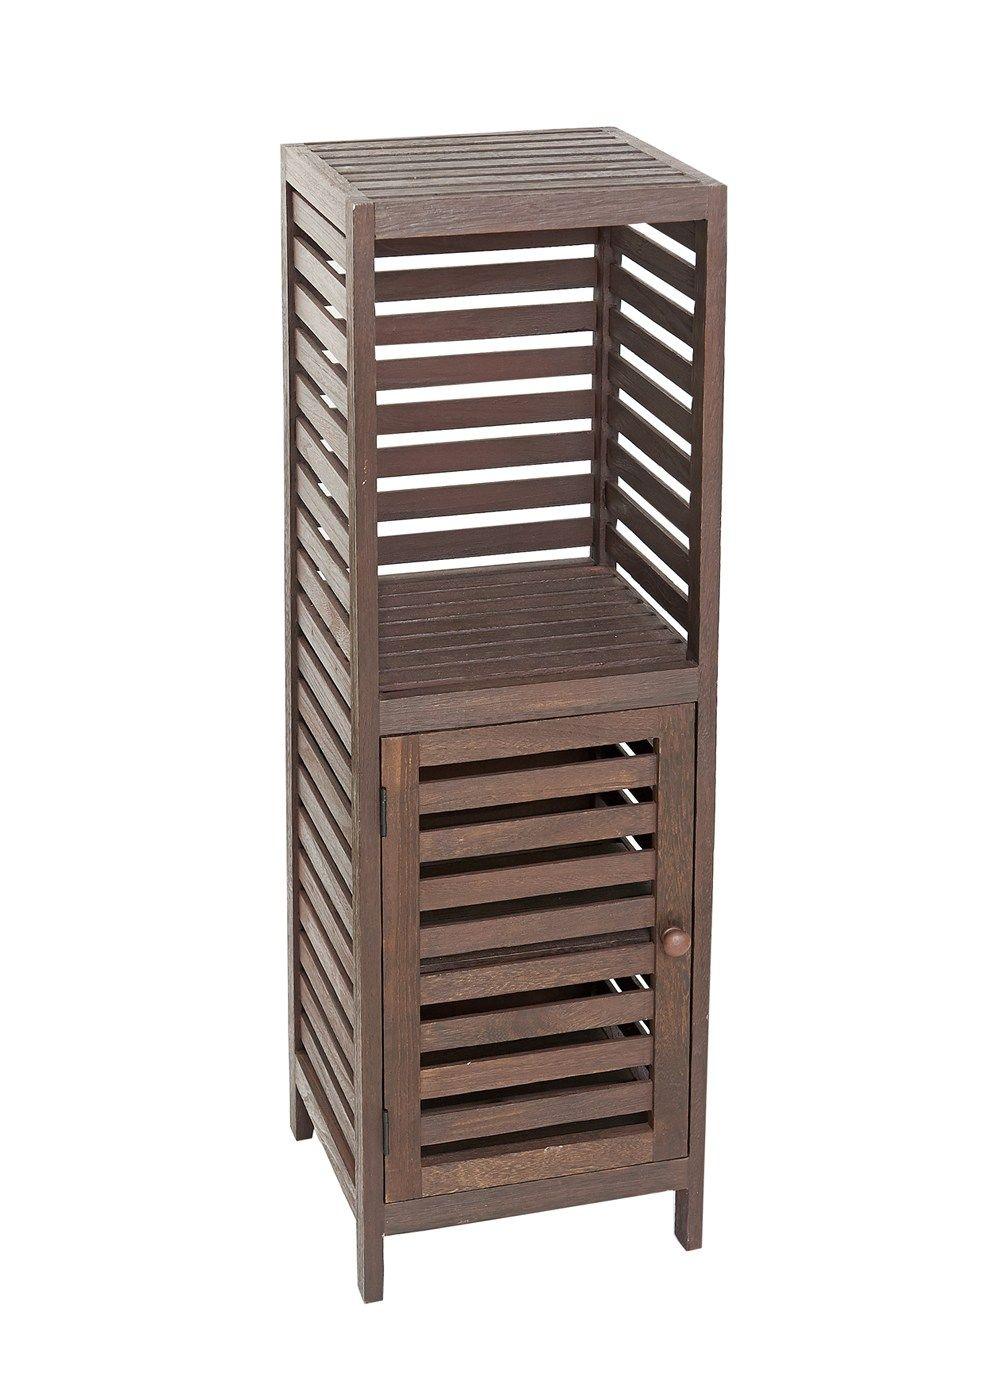 Slatted Wooden Cupboard 27 5cm X 29cm X 91cm Matalan Wooden Cupboard